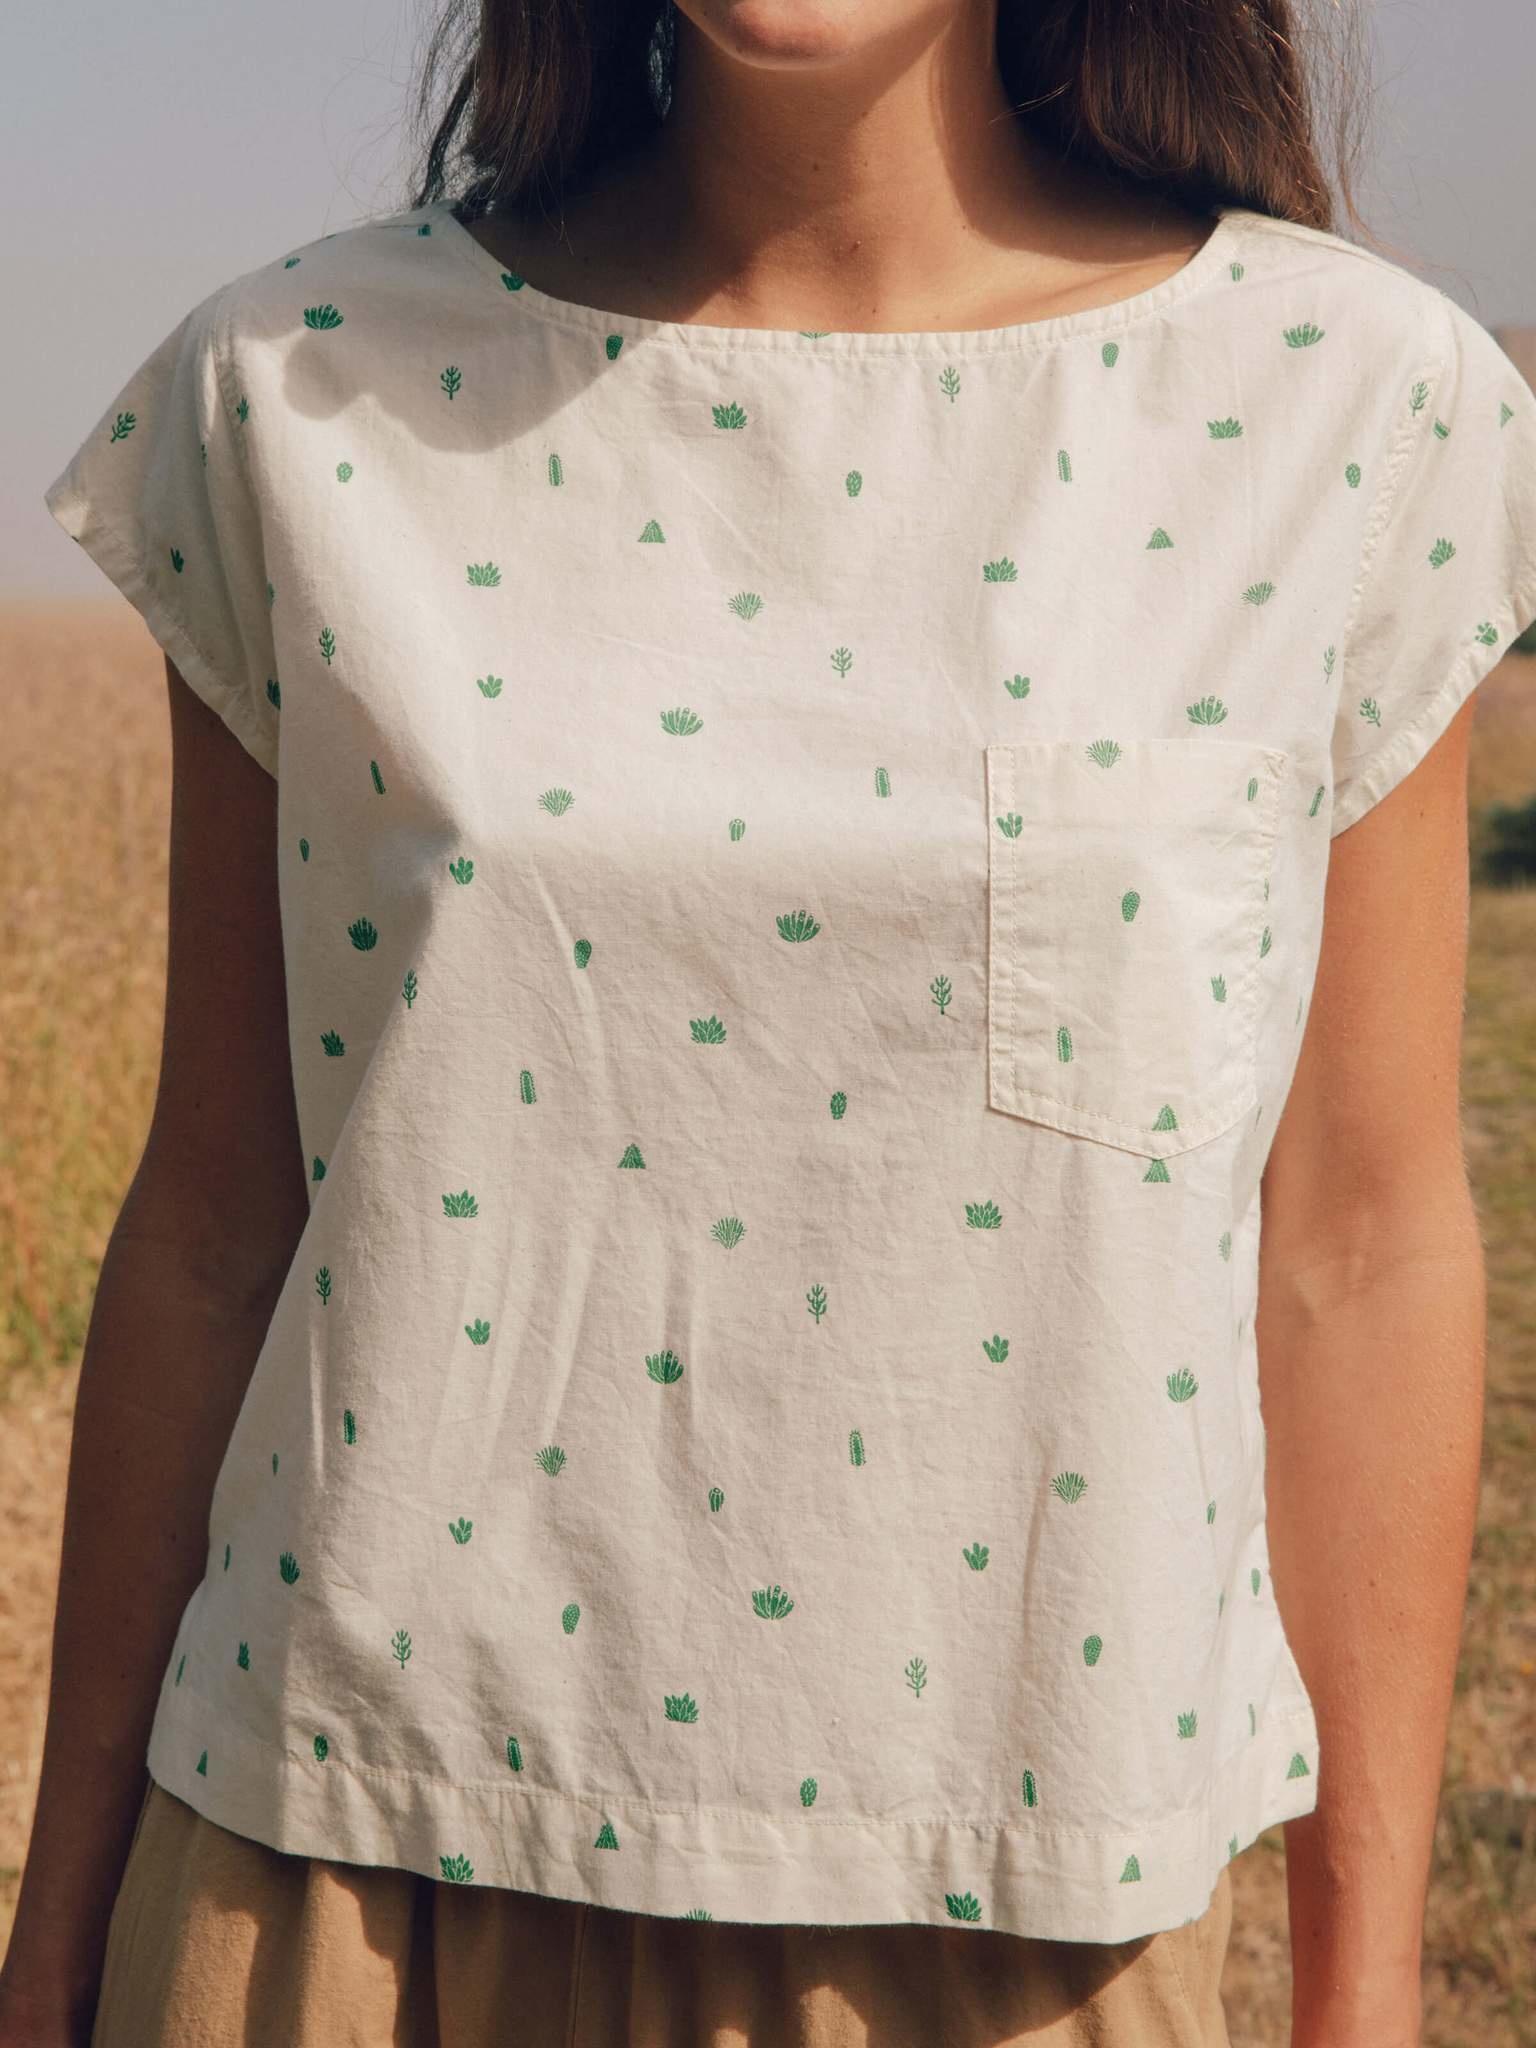 Mollusk Printed Cotton Top